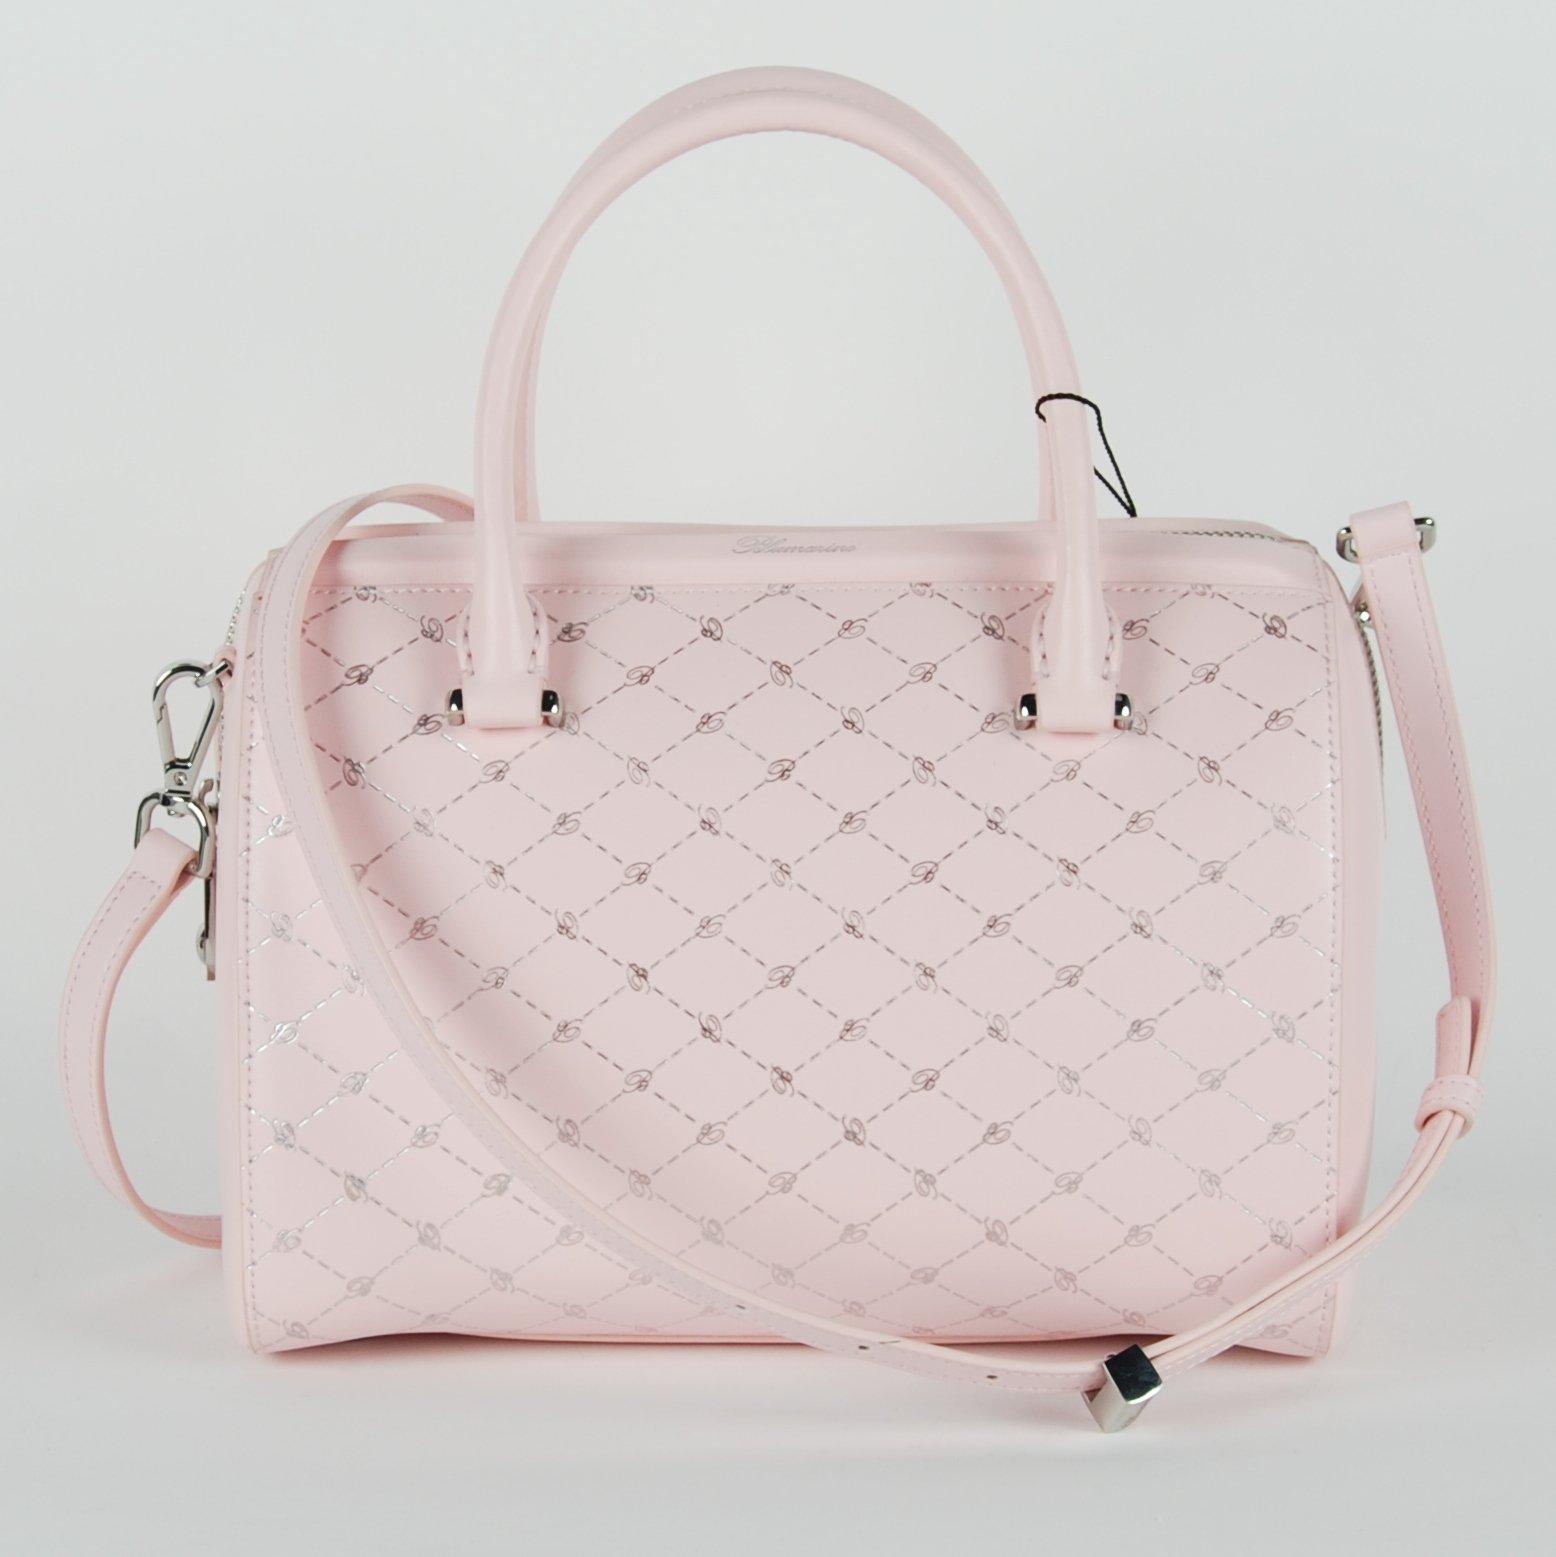 Blumarine Women's Bowling Bag Pink BL1421539